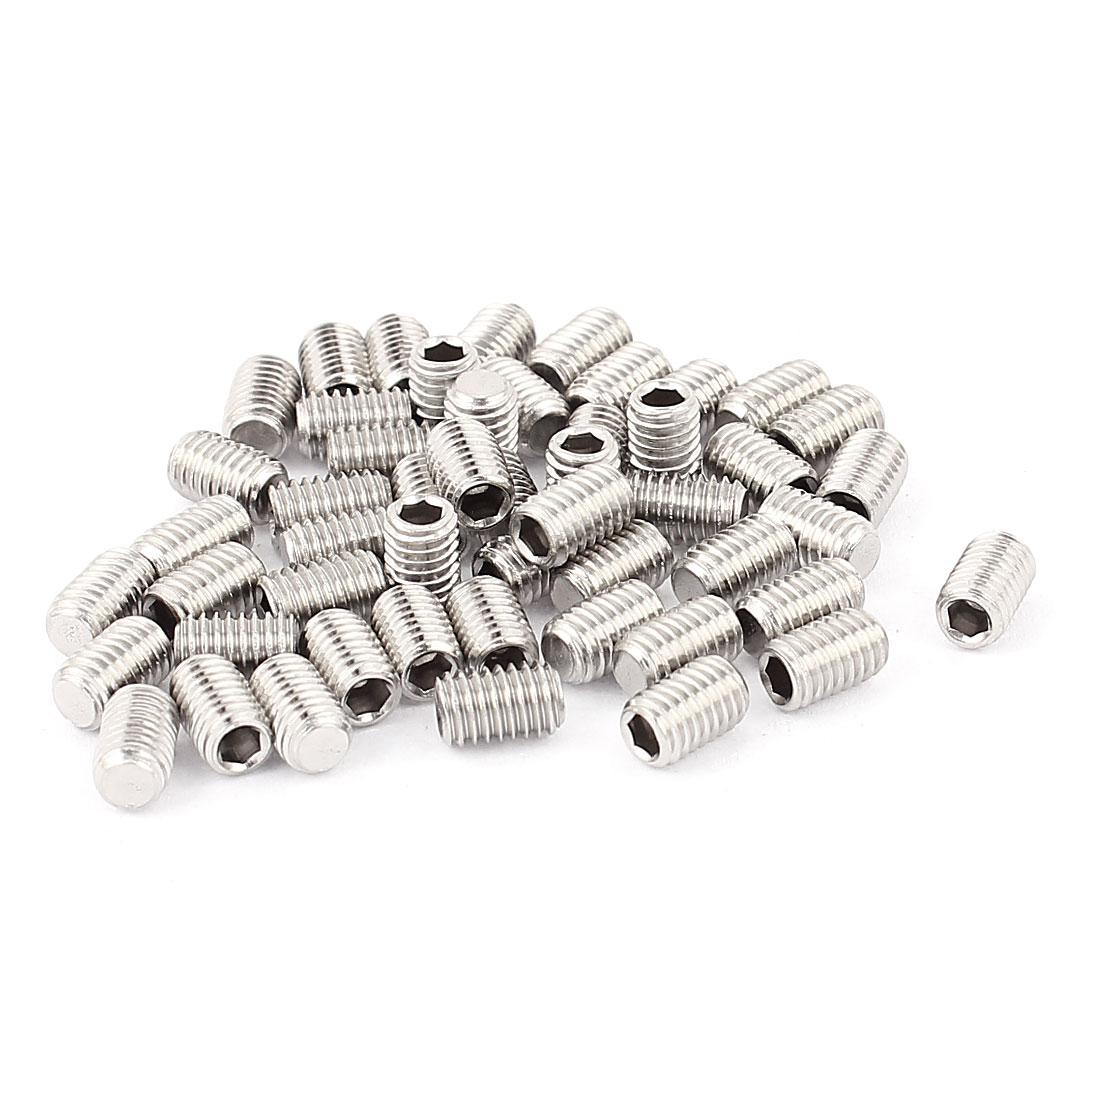 50pcs 304 Stainless Steel M5x8mm Threaded Hex Socket Set Grub Screws